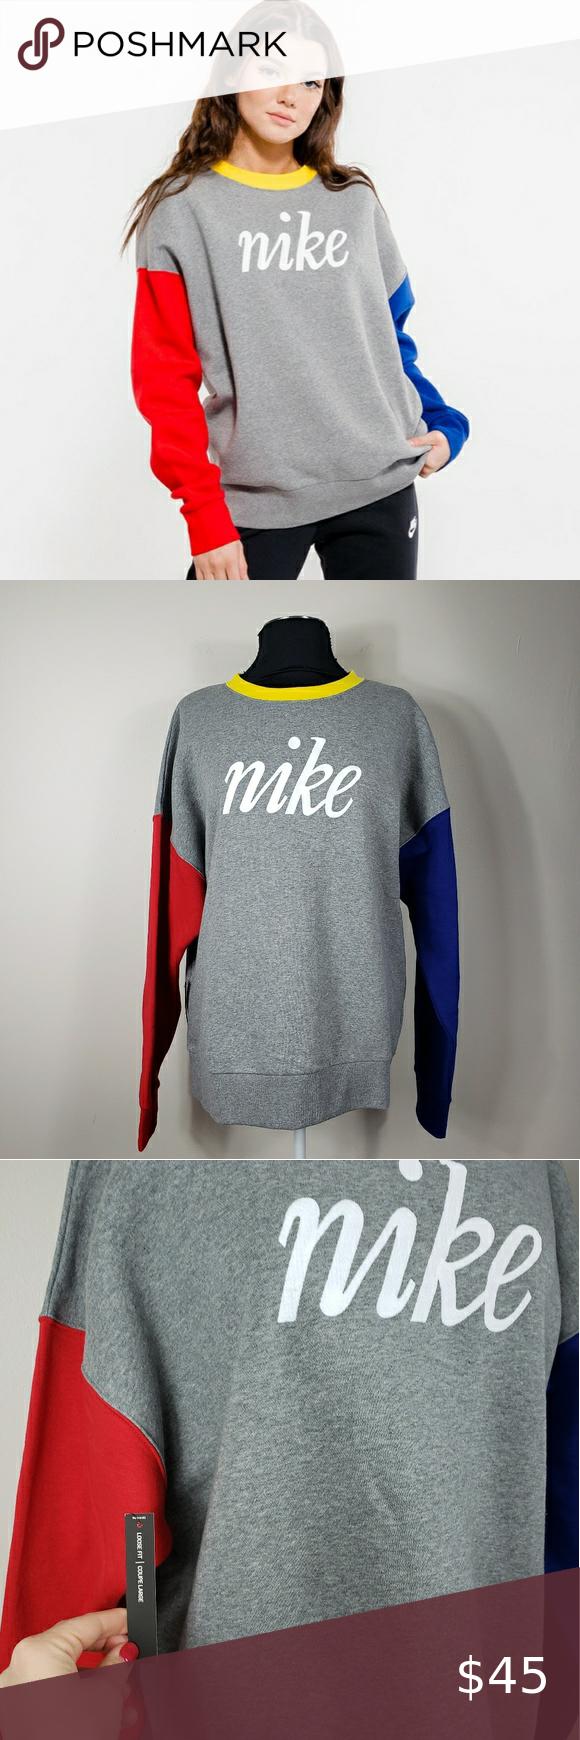 Nike Nsw Colorblock Sweatshirt Color Block Sweatshirt Sweatshirts Loose Sweatshirt [ 1740 x 580 Pixel ]